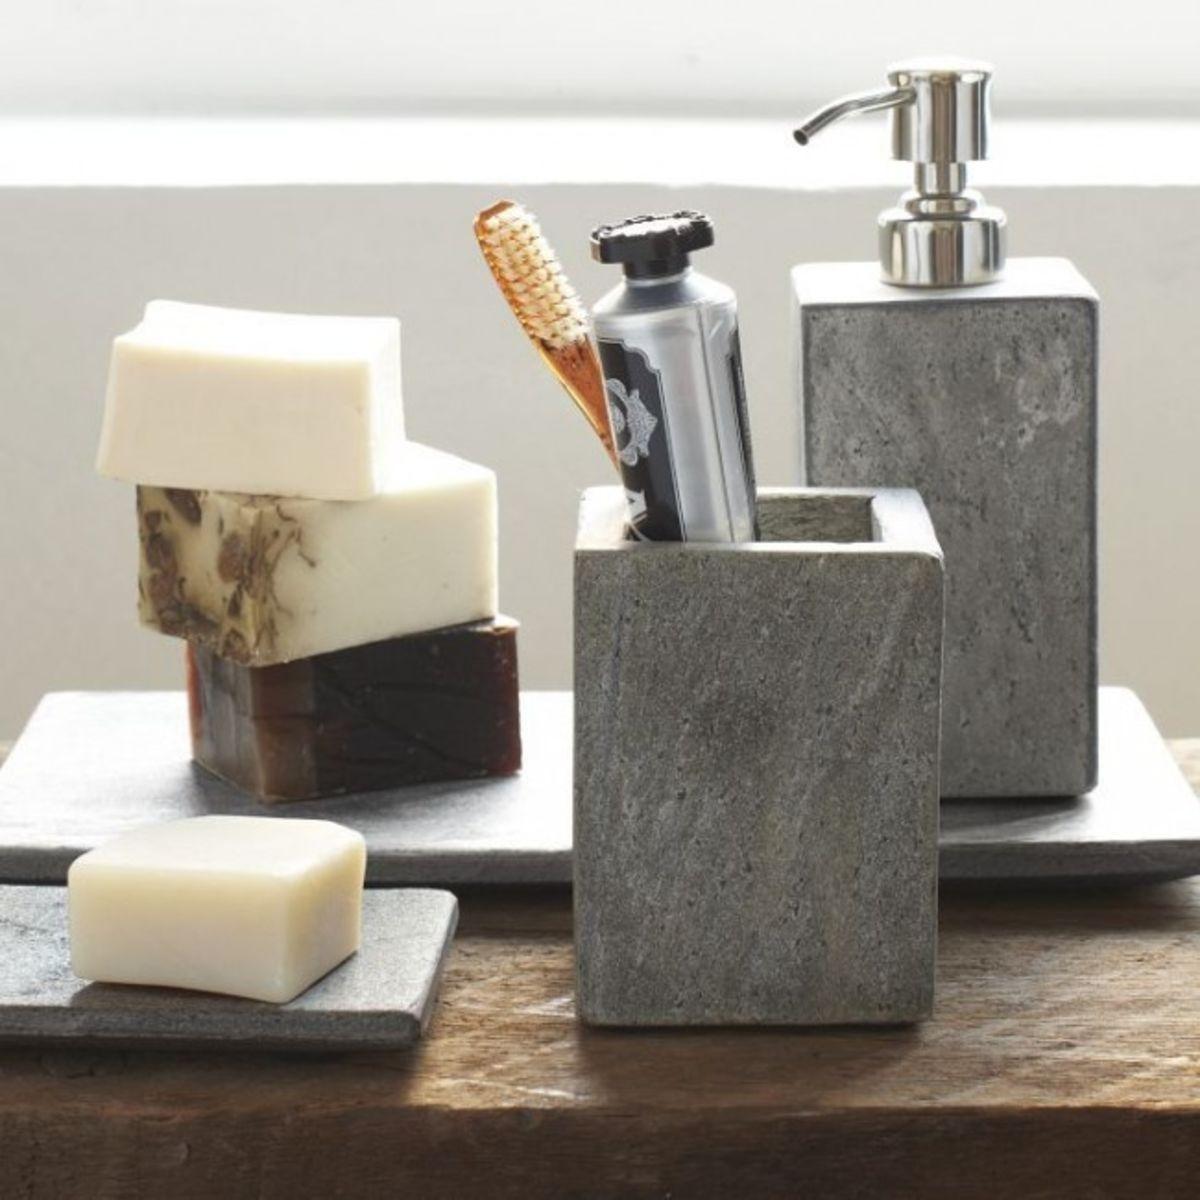 Stone Bathroom Accessories Ideas On Foter